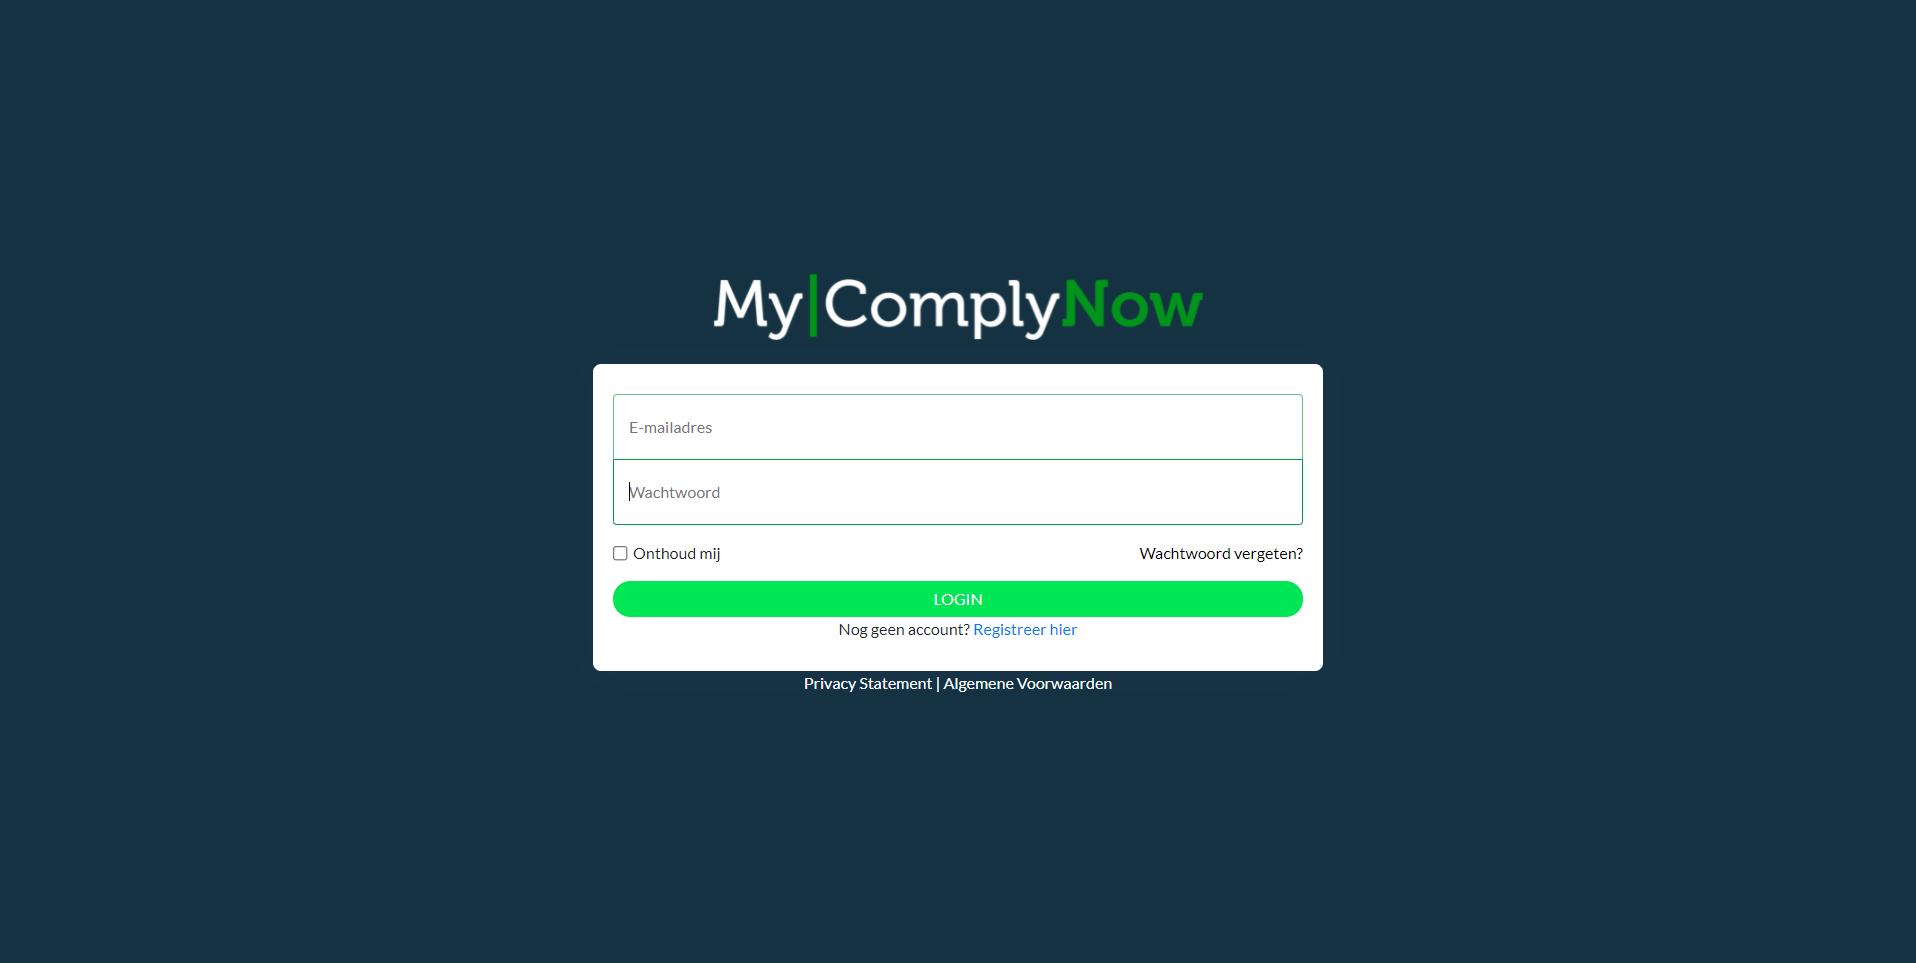 MyComplyNow Login